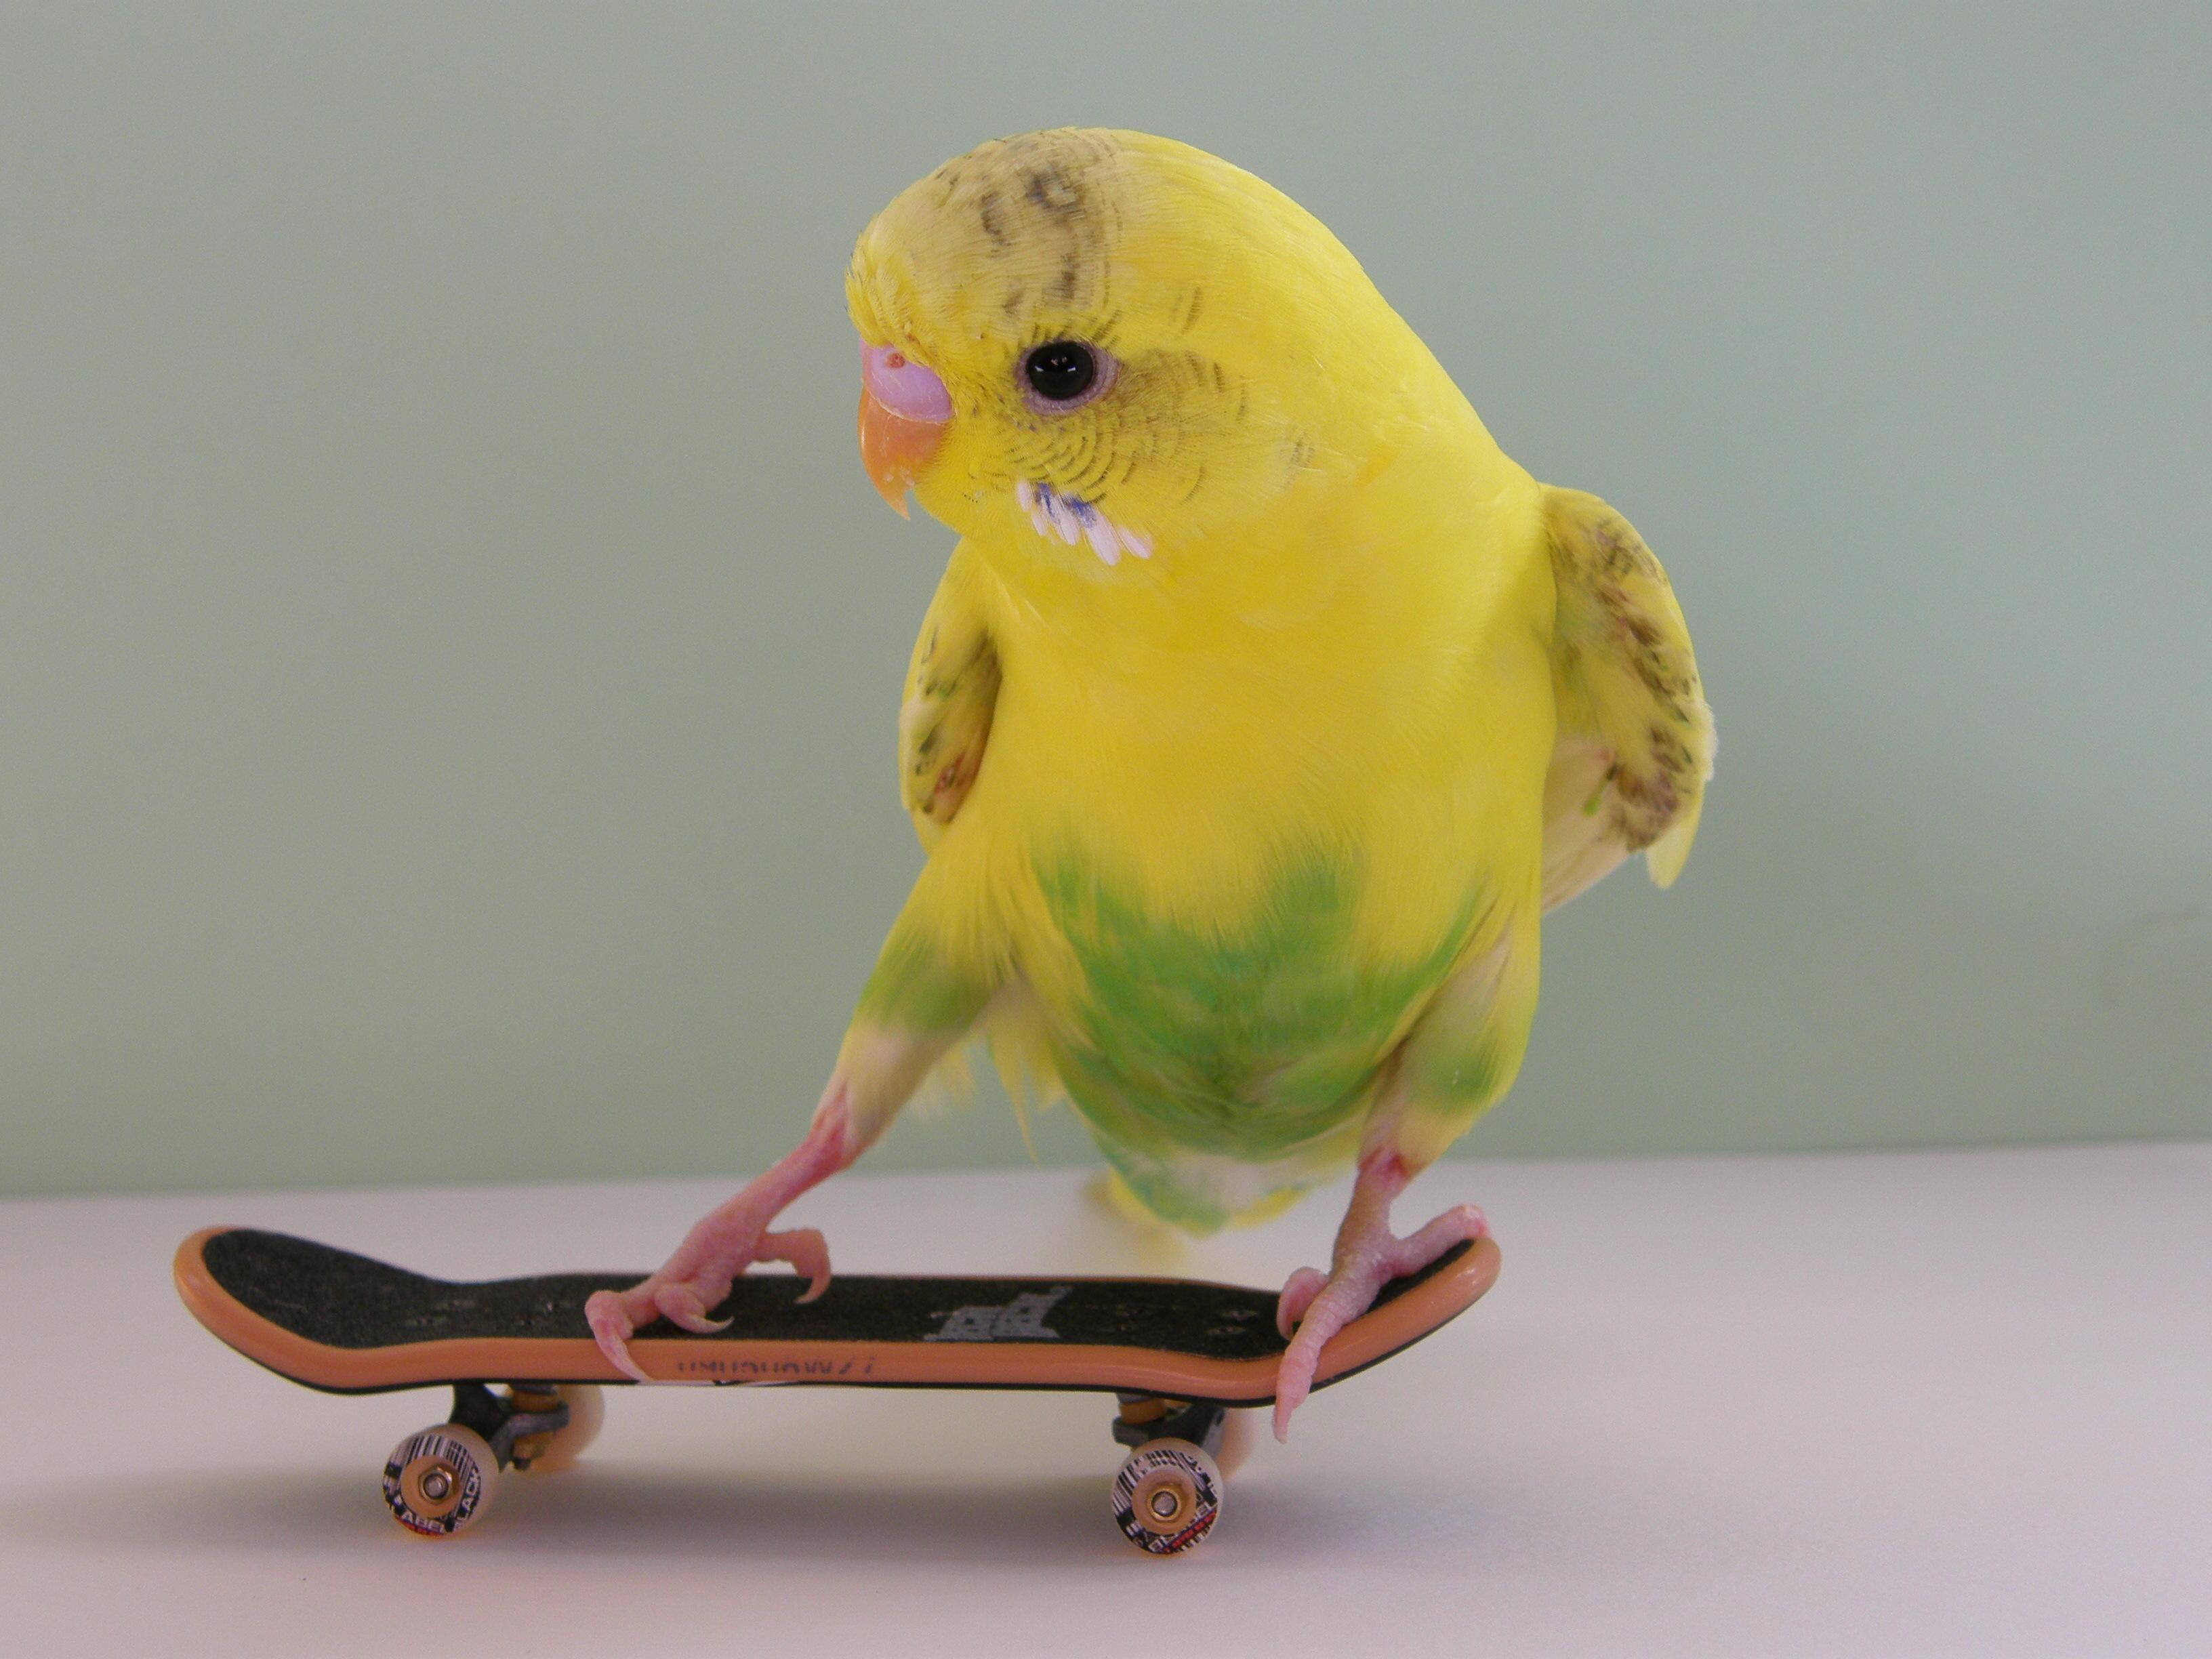 Cute Animals Playing Soccer Wallpaper Skateboarding Budgies Triestevisier